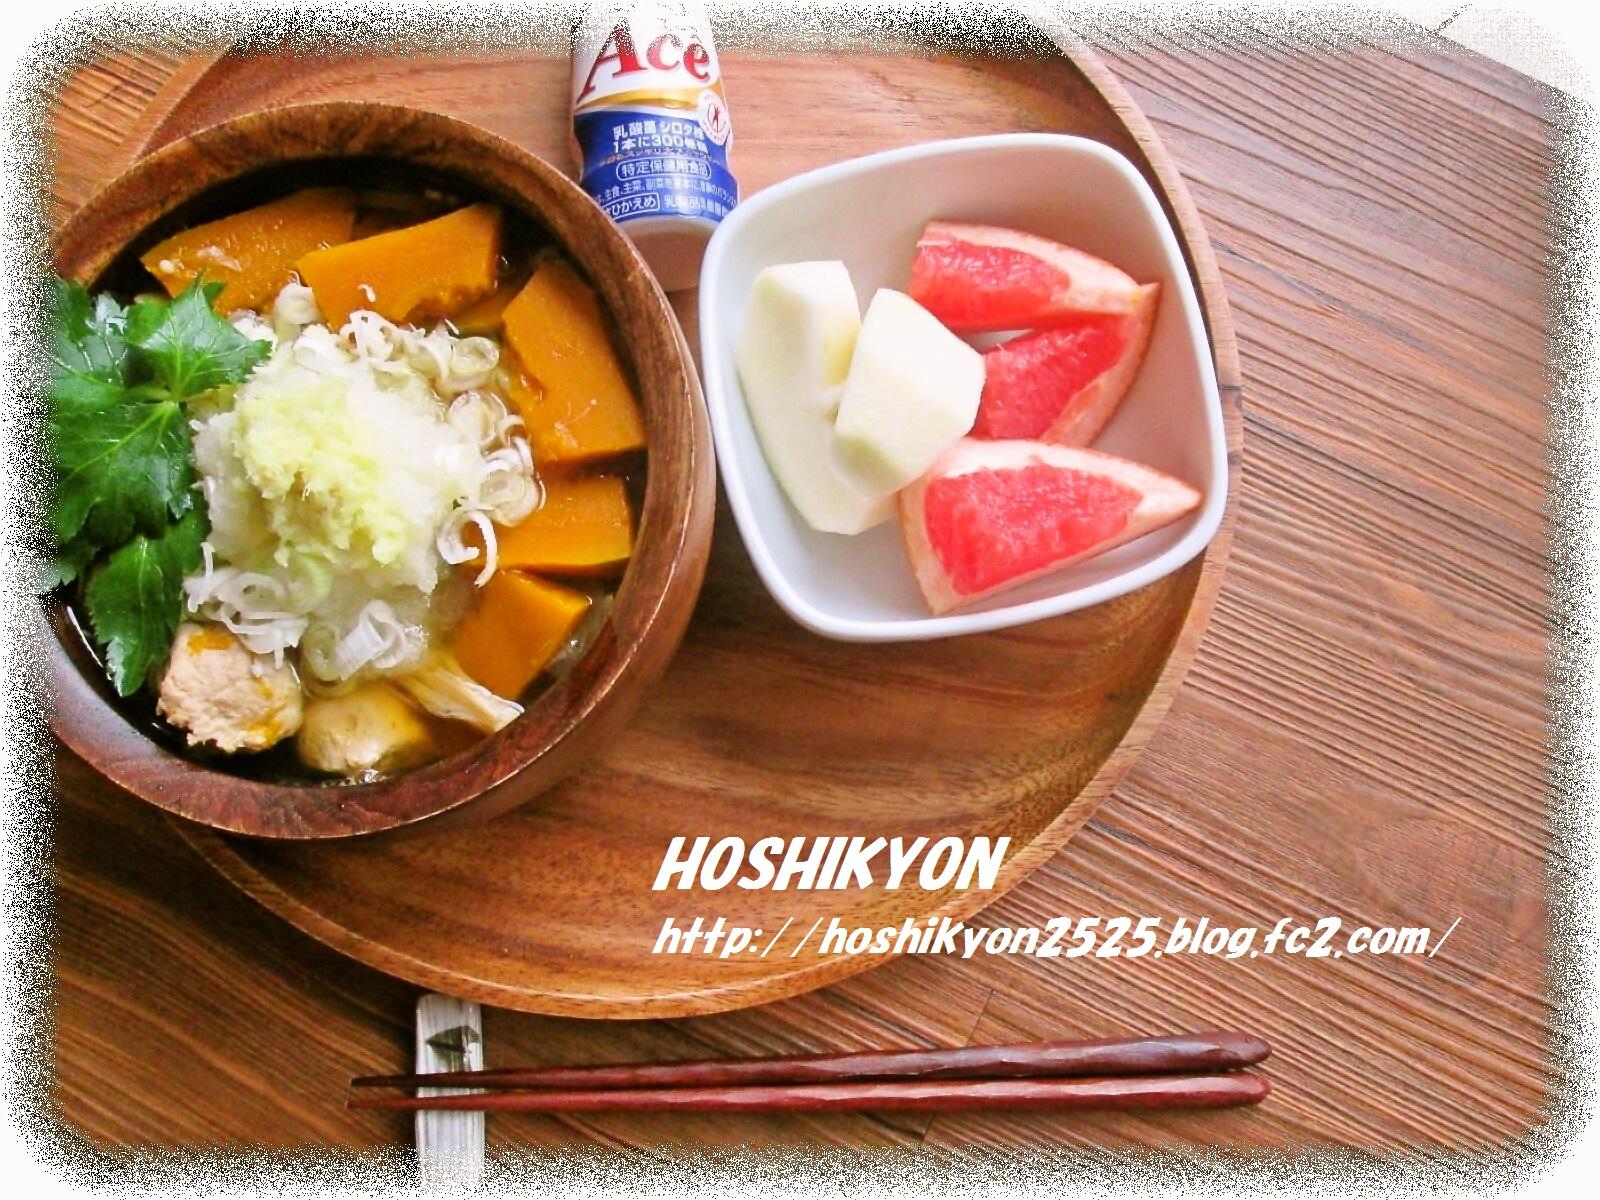 foodpic5398098.jpg